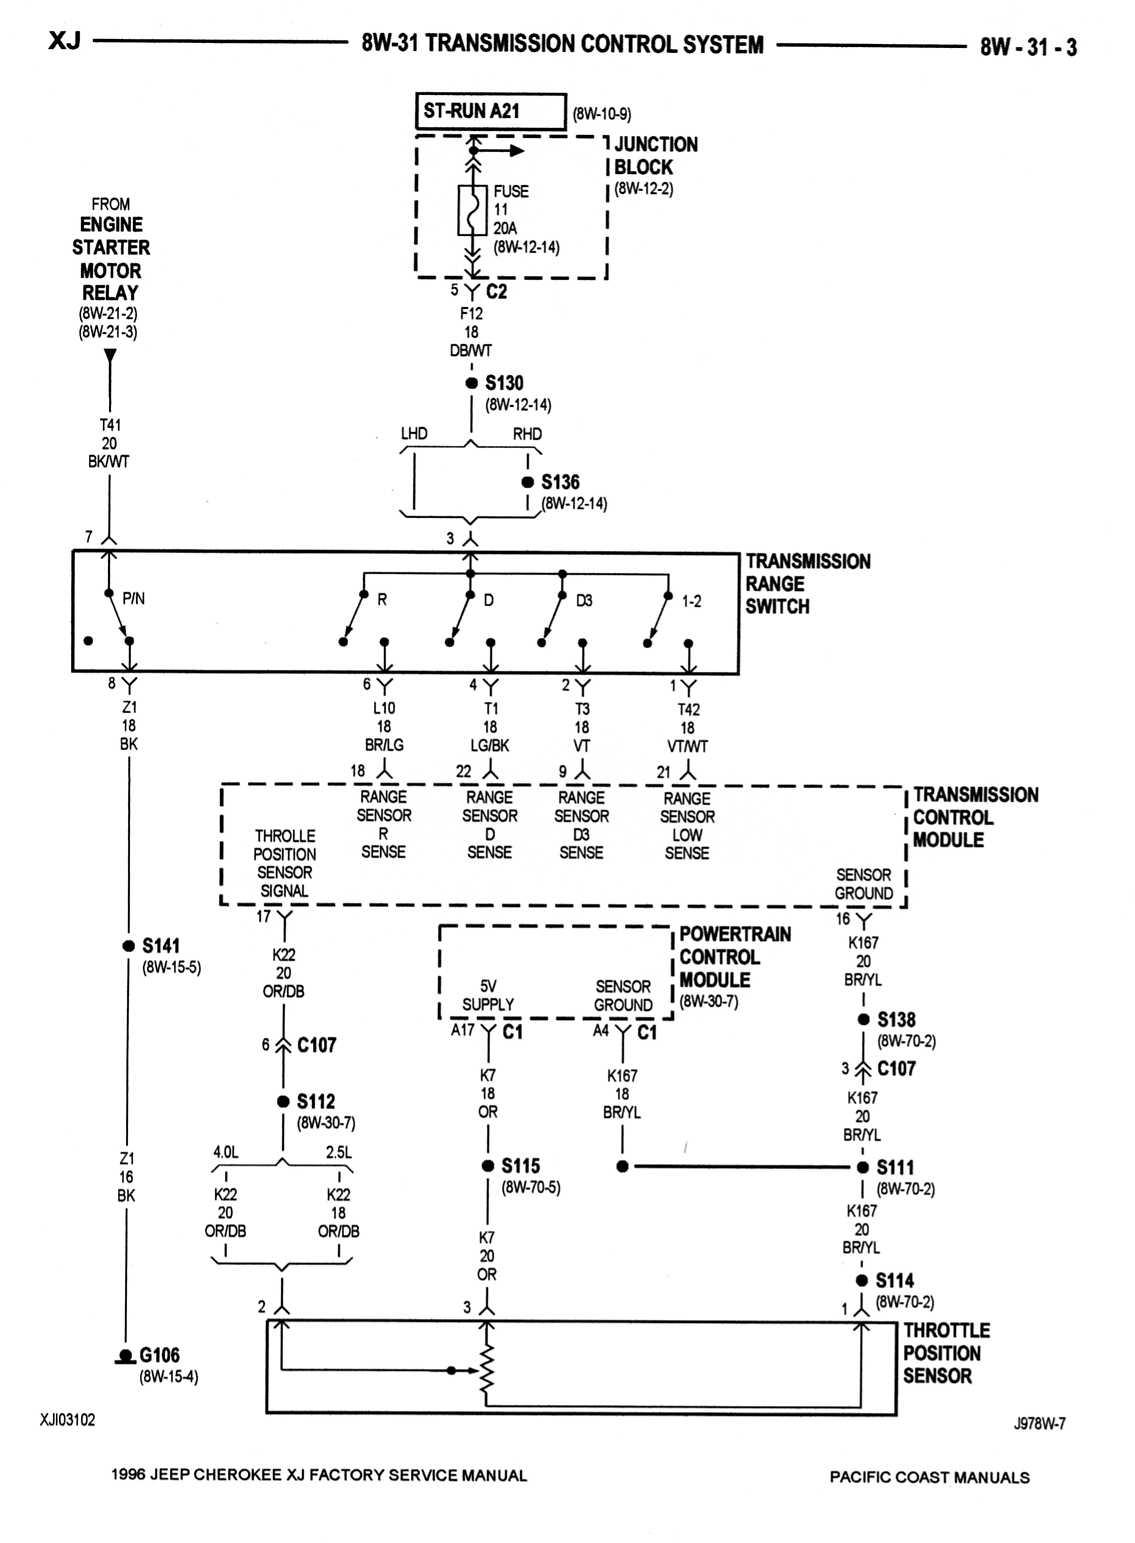 Tcu Pin8 Wiring Problem